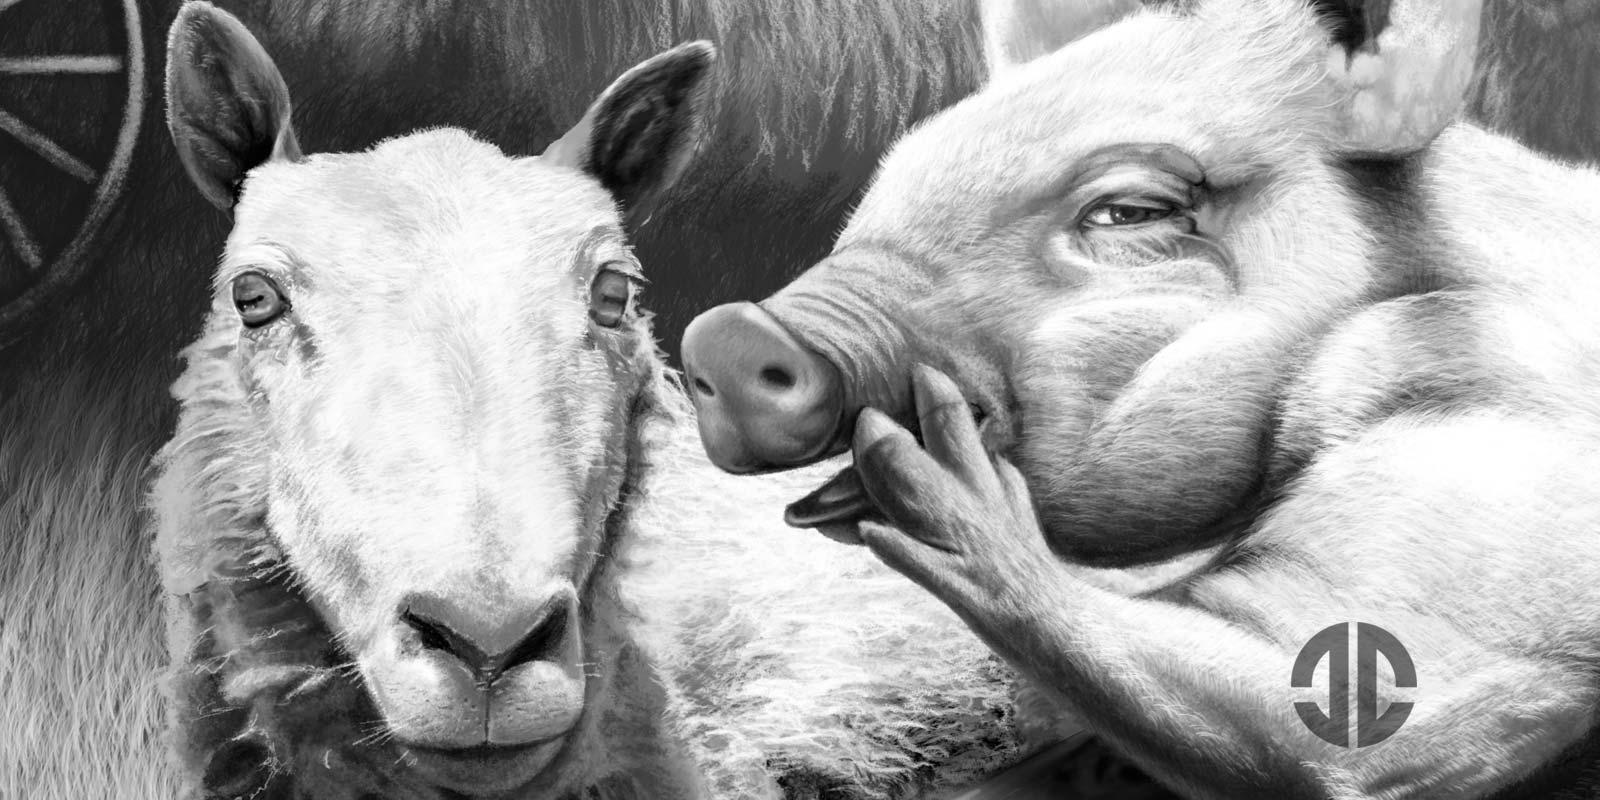 squealer animal farm